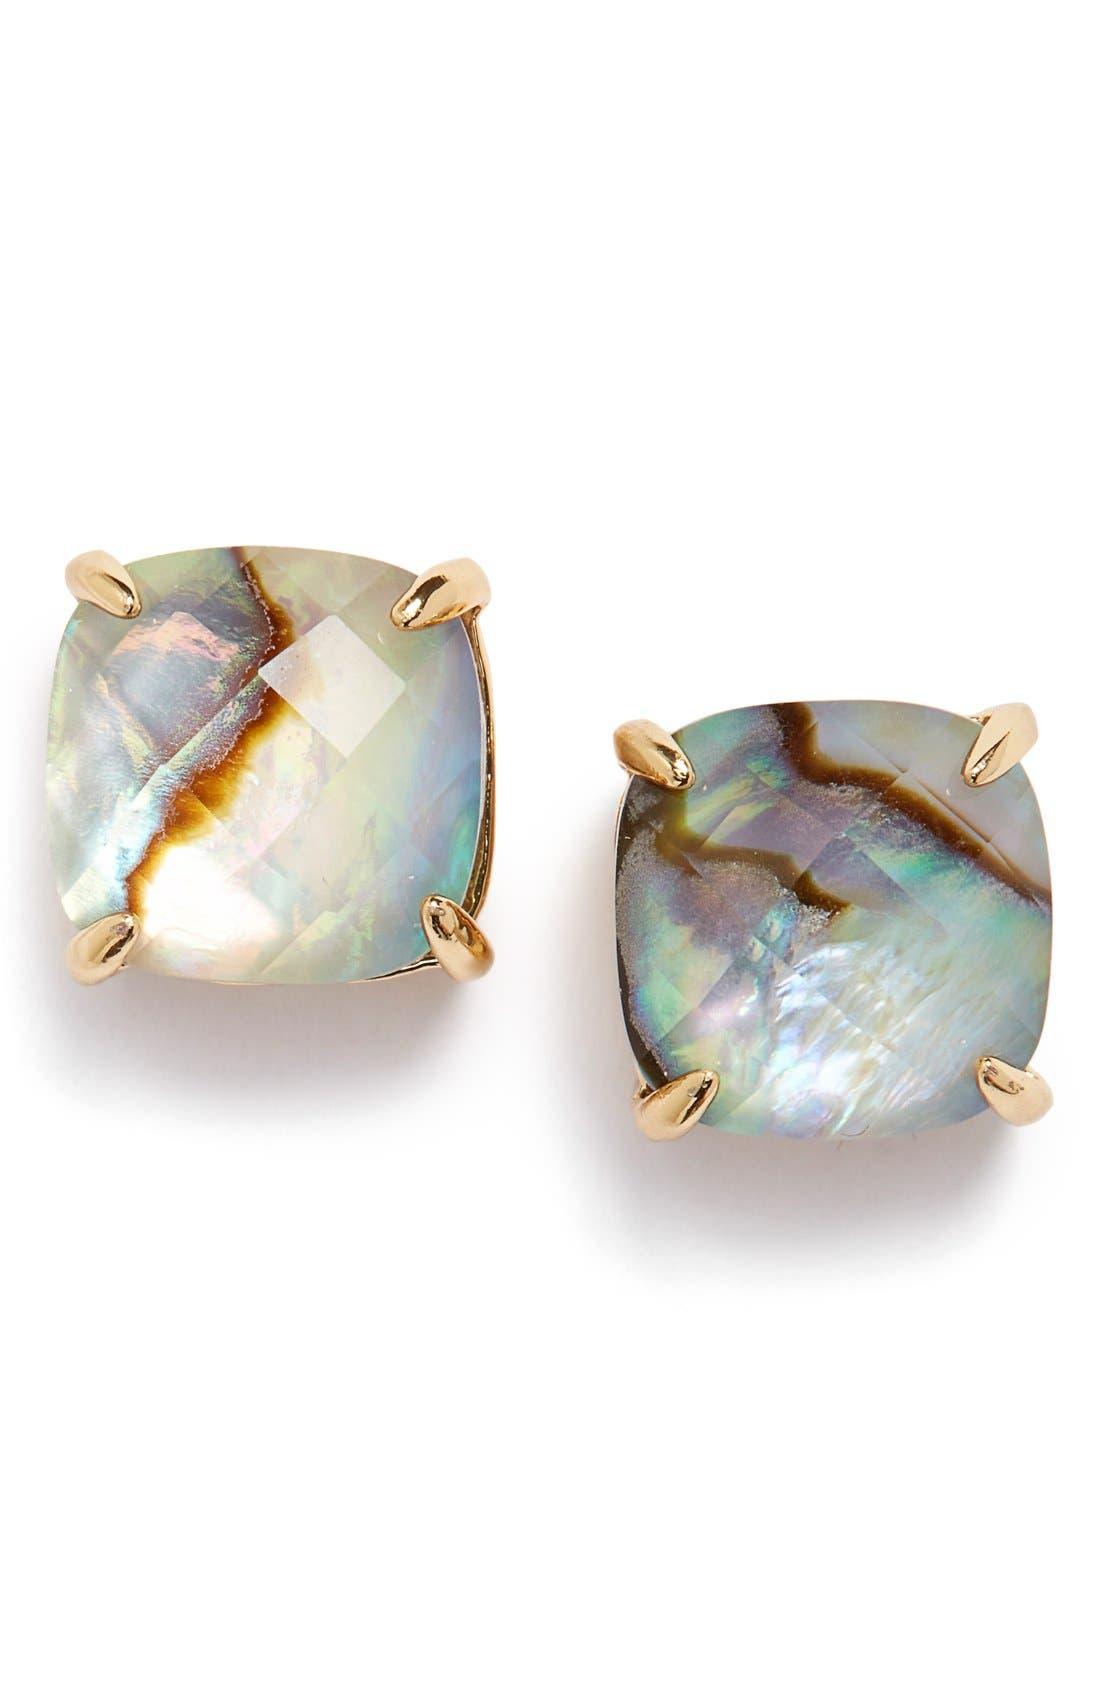 Main Image - kate spade new york mini small square semiprecious stone stud earrings